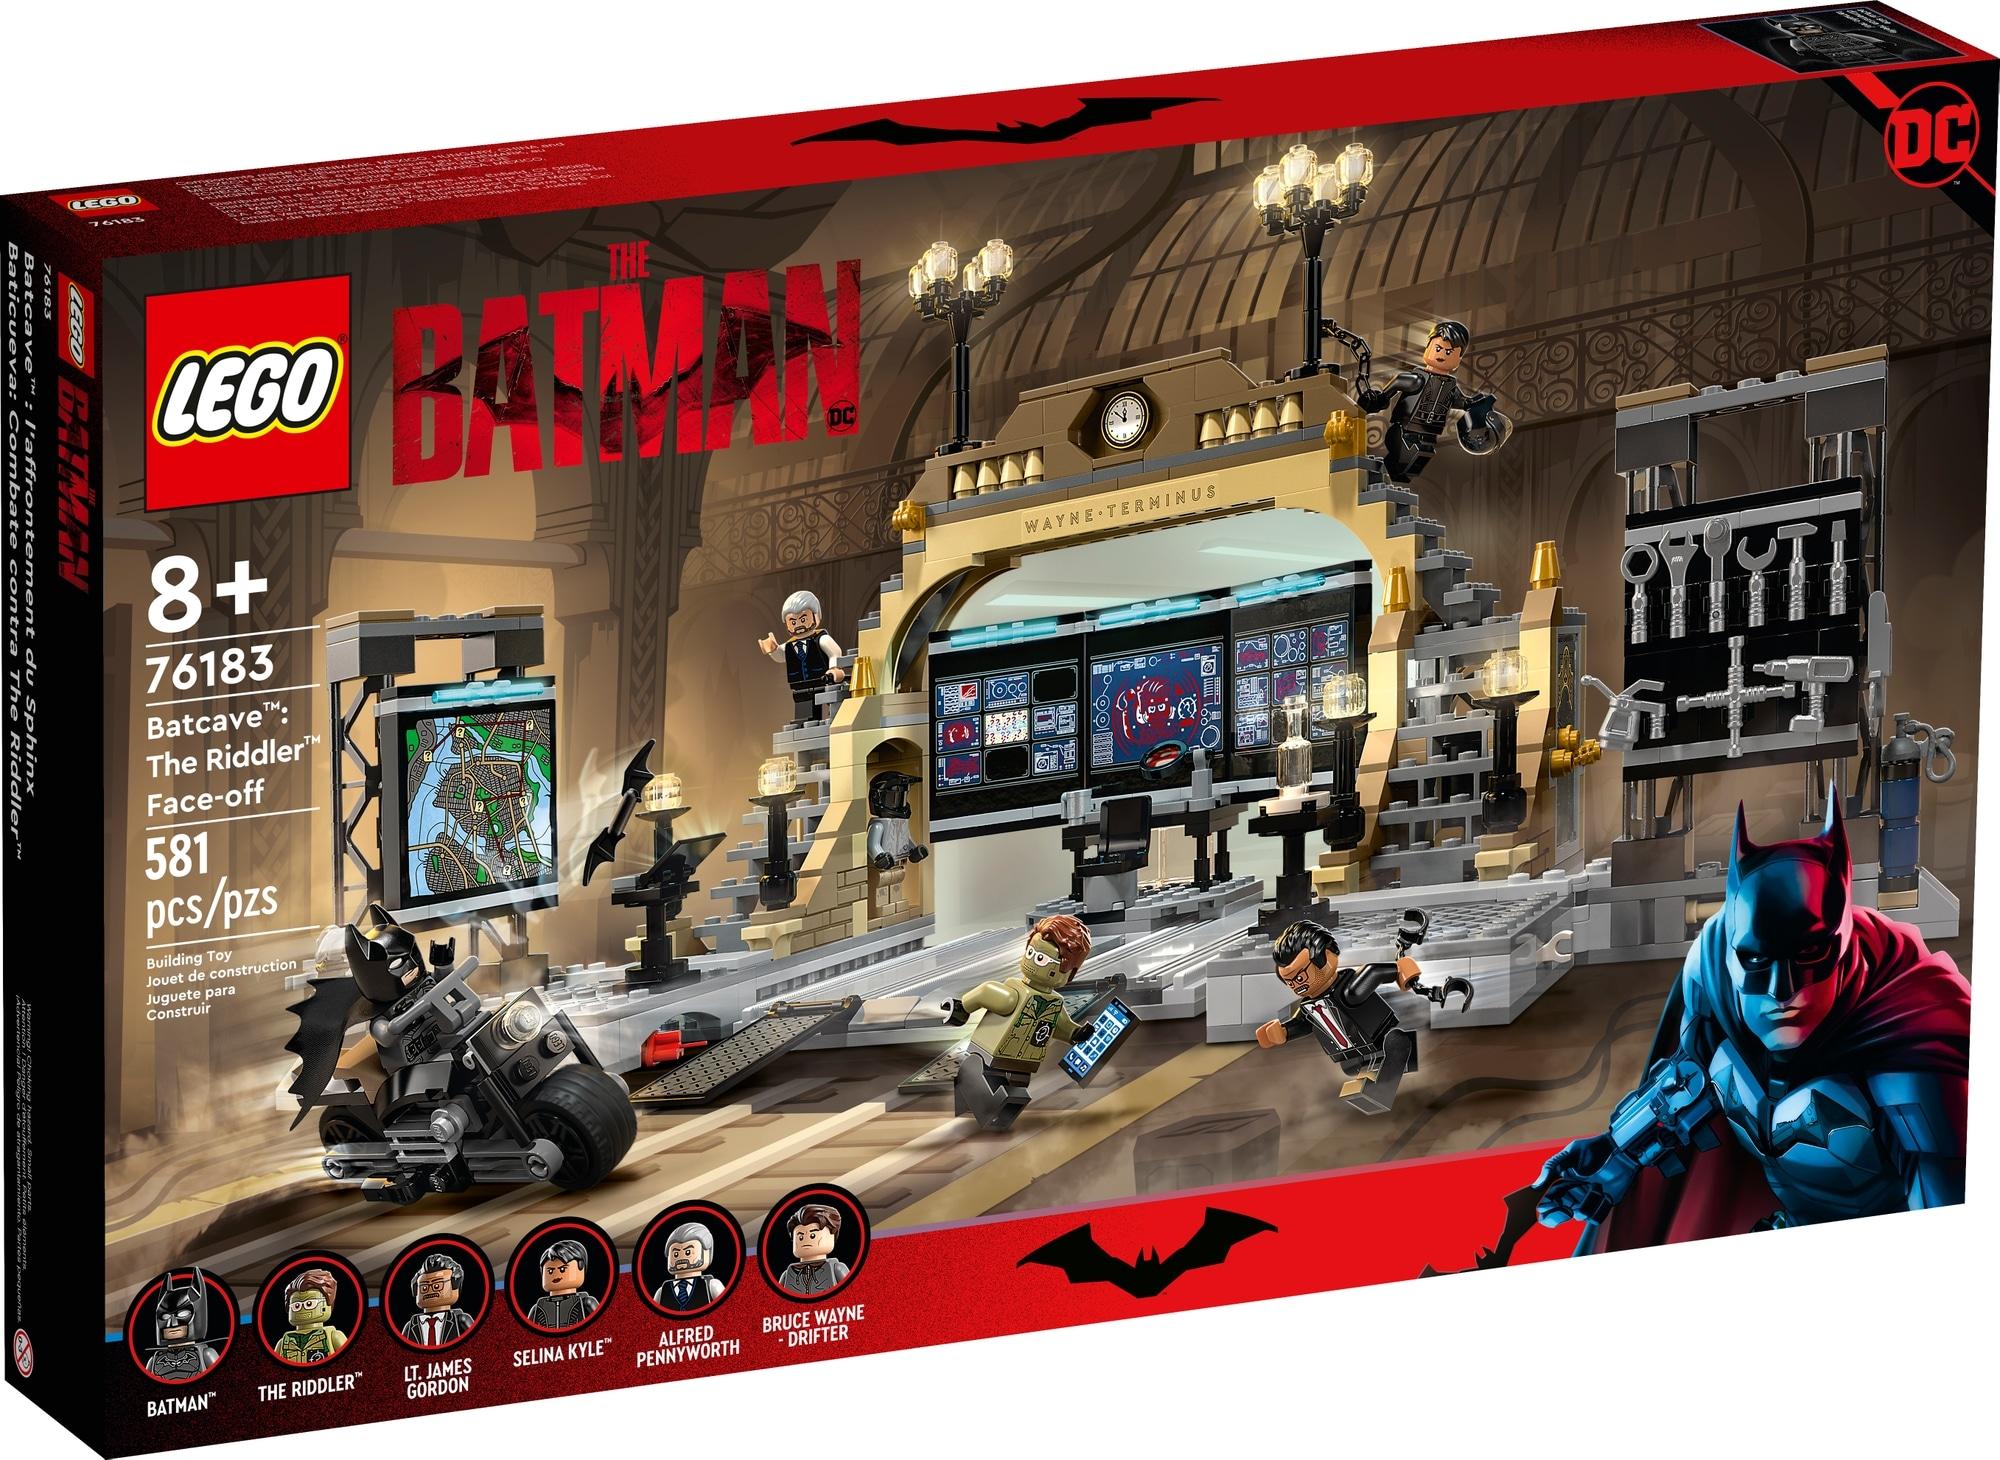 LEGO Dc 76183 Bathöhle Duell Mit Riddler 2